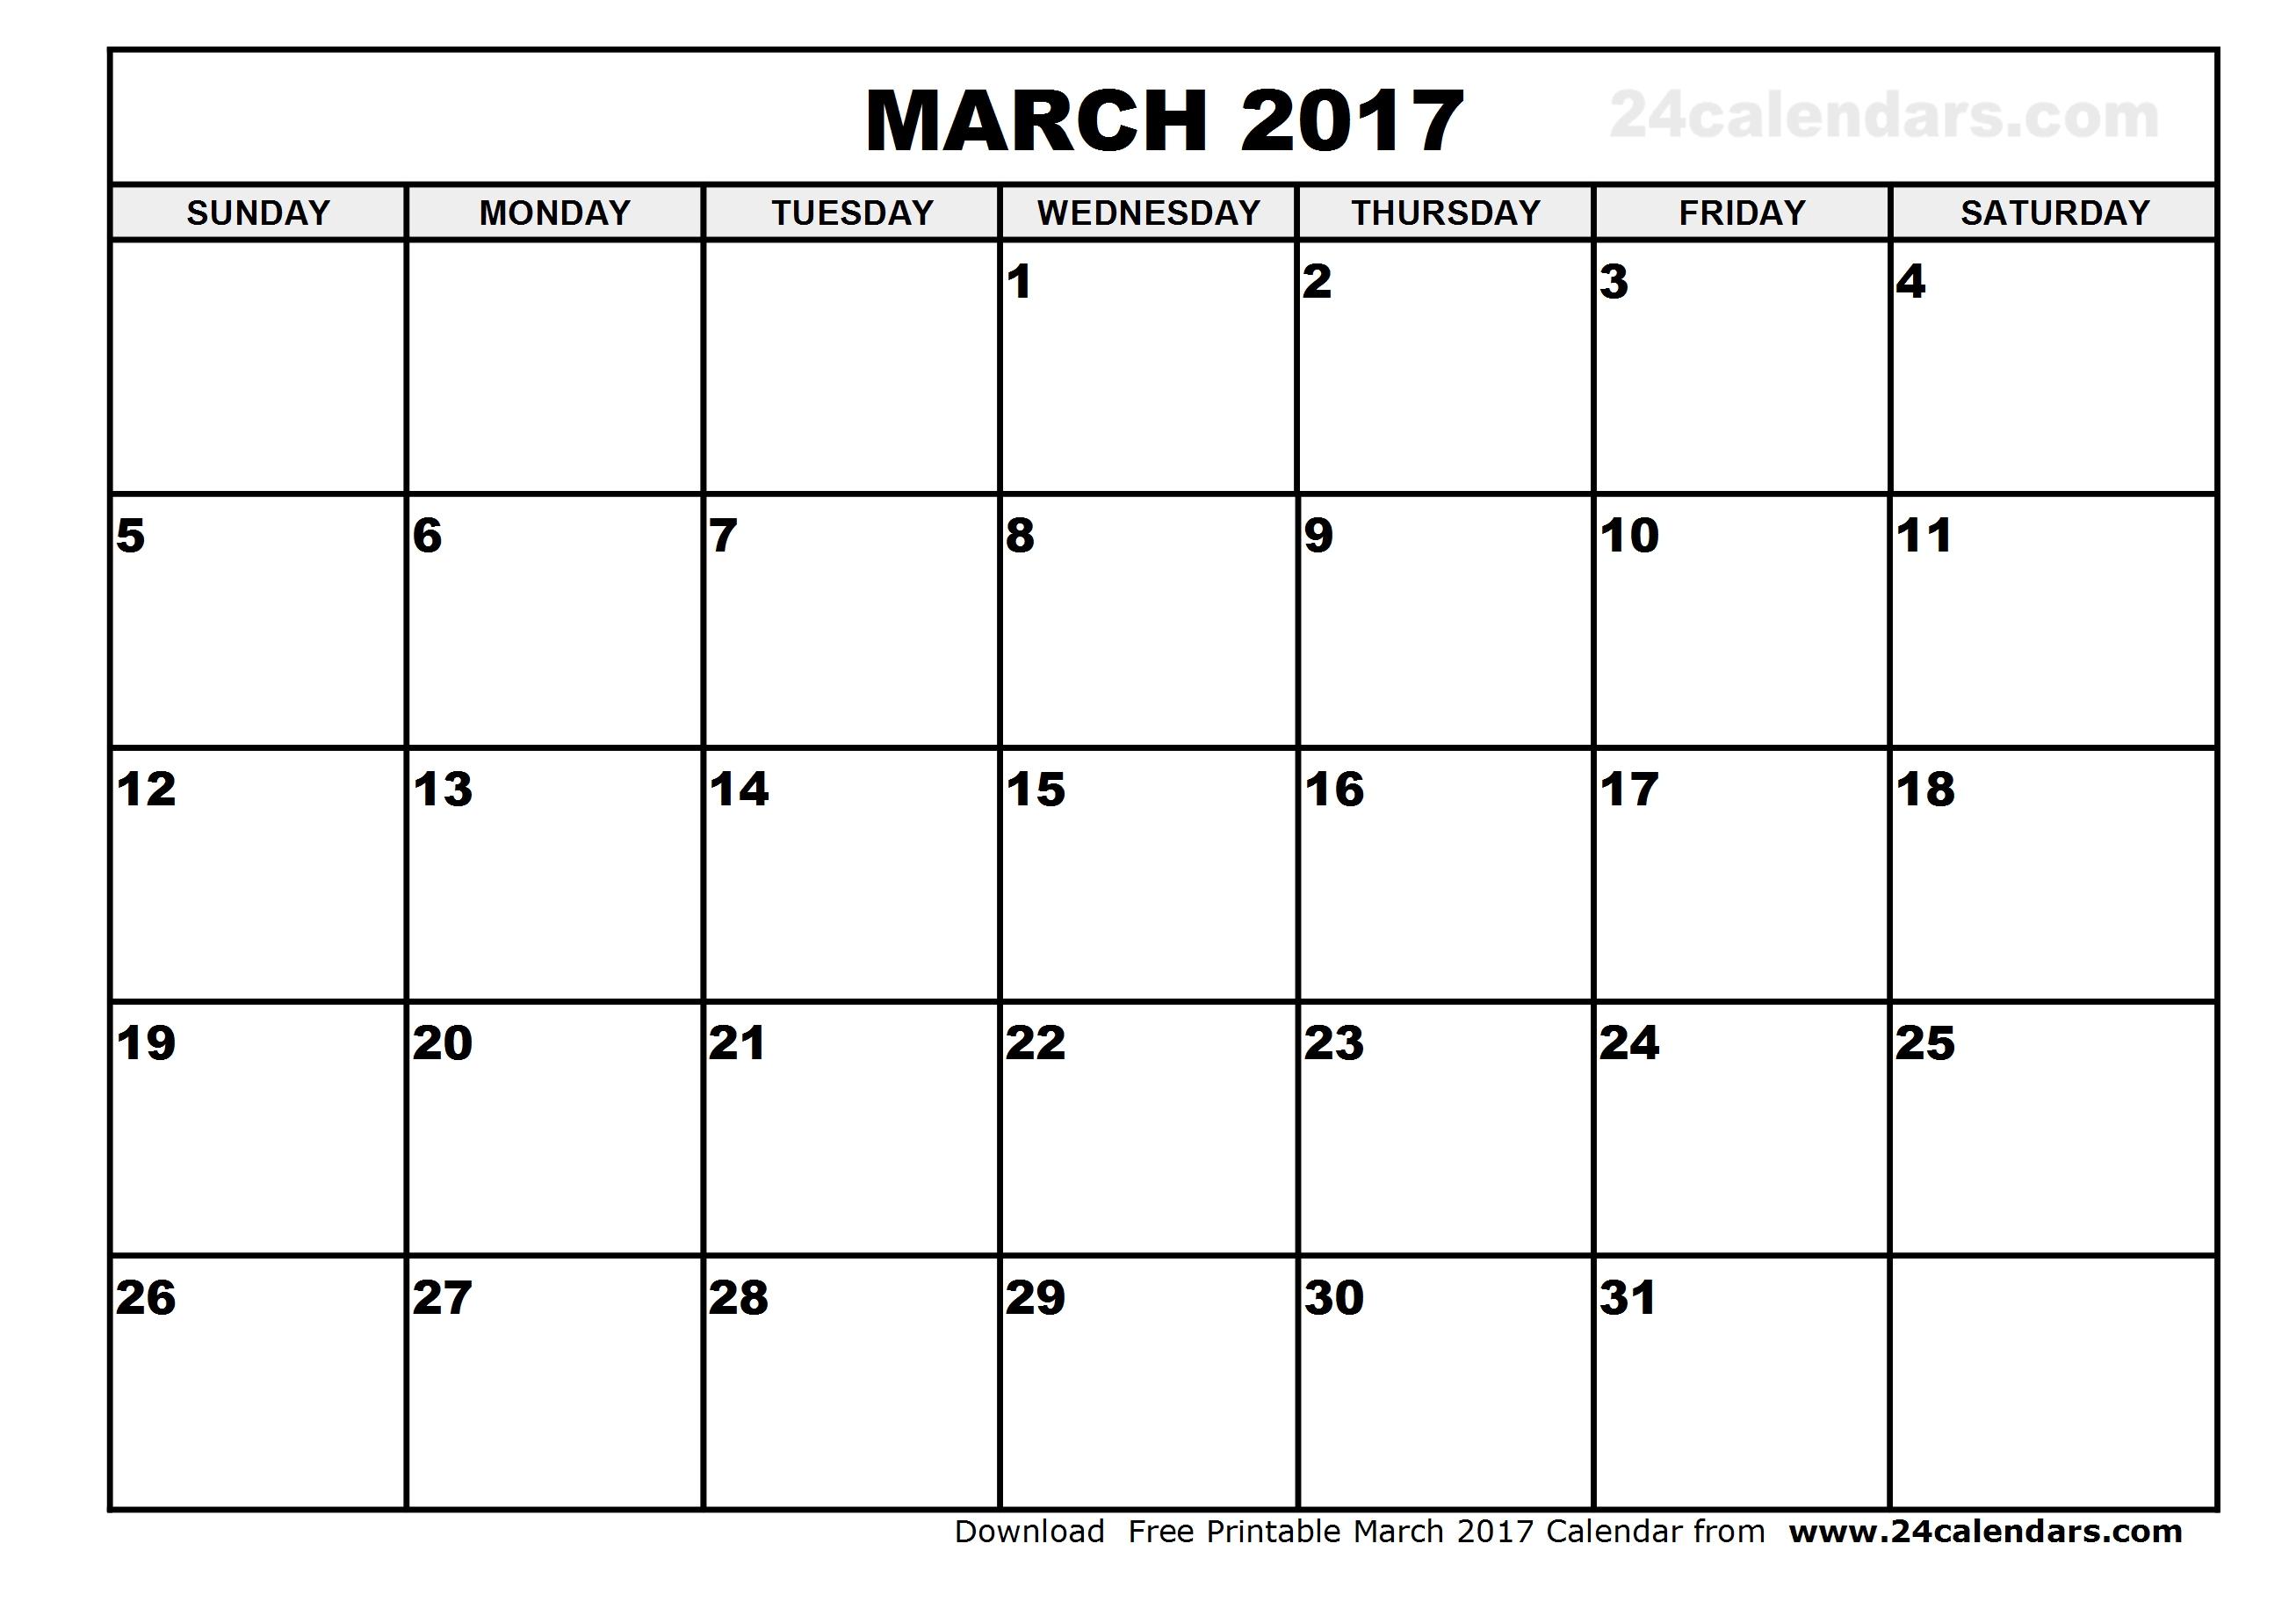 March 1 calendar page clipart banner transparent download March 2017 Calendar Clipart banner transparent download